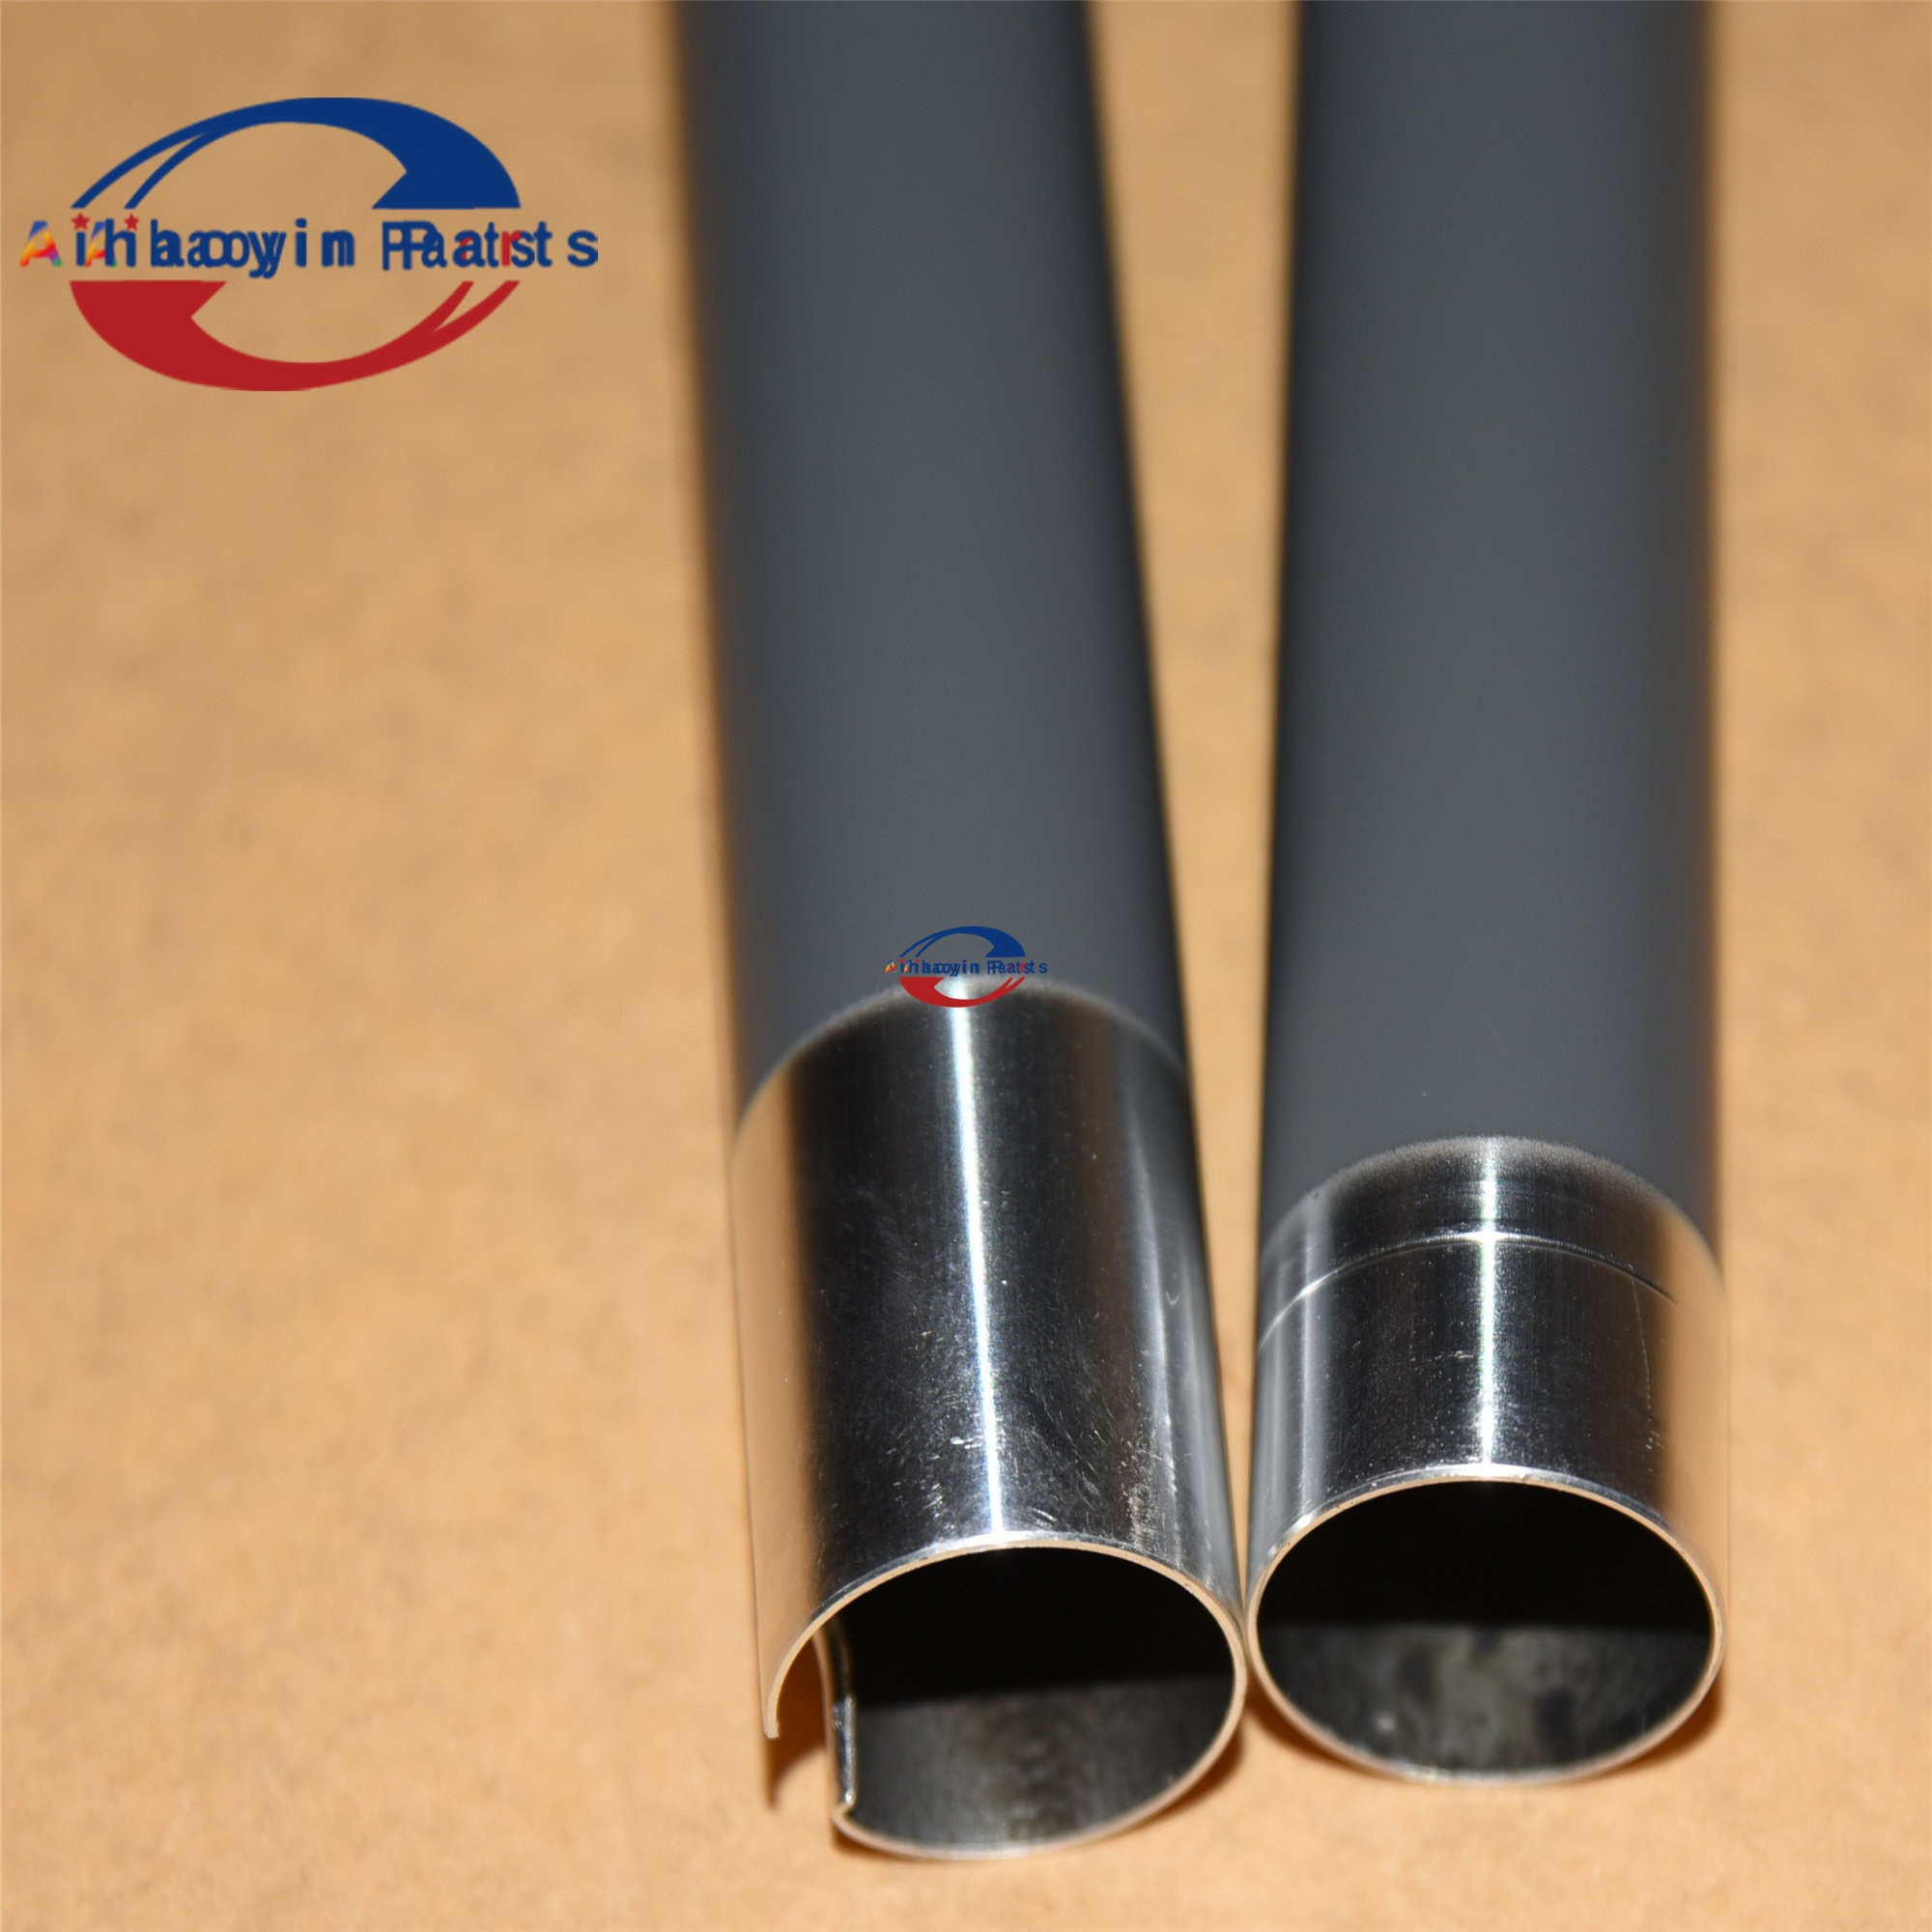 6pcs 2HS25230 2HS25231 Upper Fuser Roller for Kyocera FS1100 1110 FS1120 FS1300 FS1320 FS1028 FS1024 FS2000 KM2810 KM2820